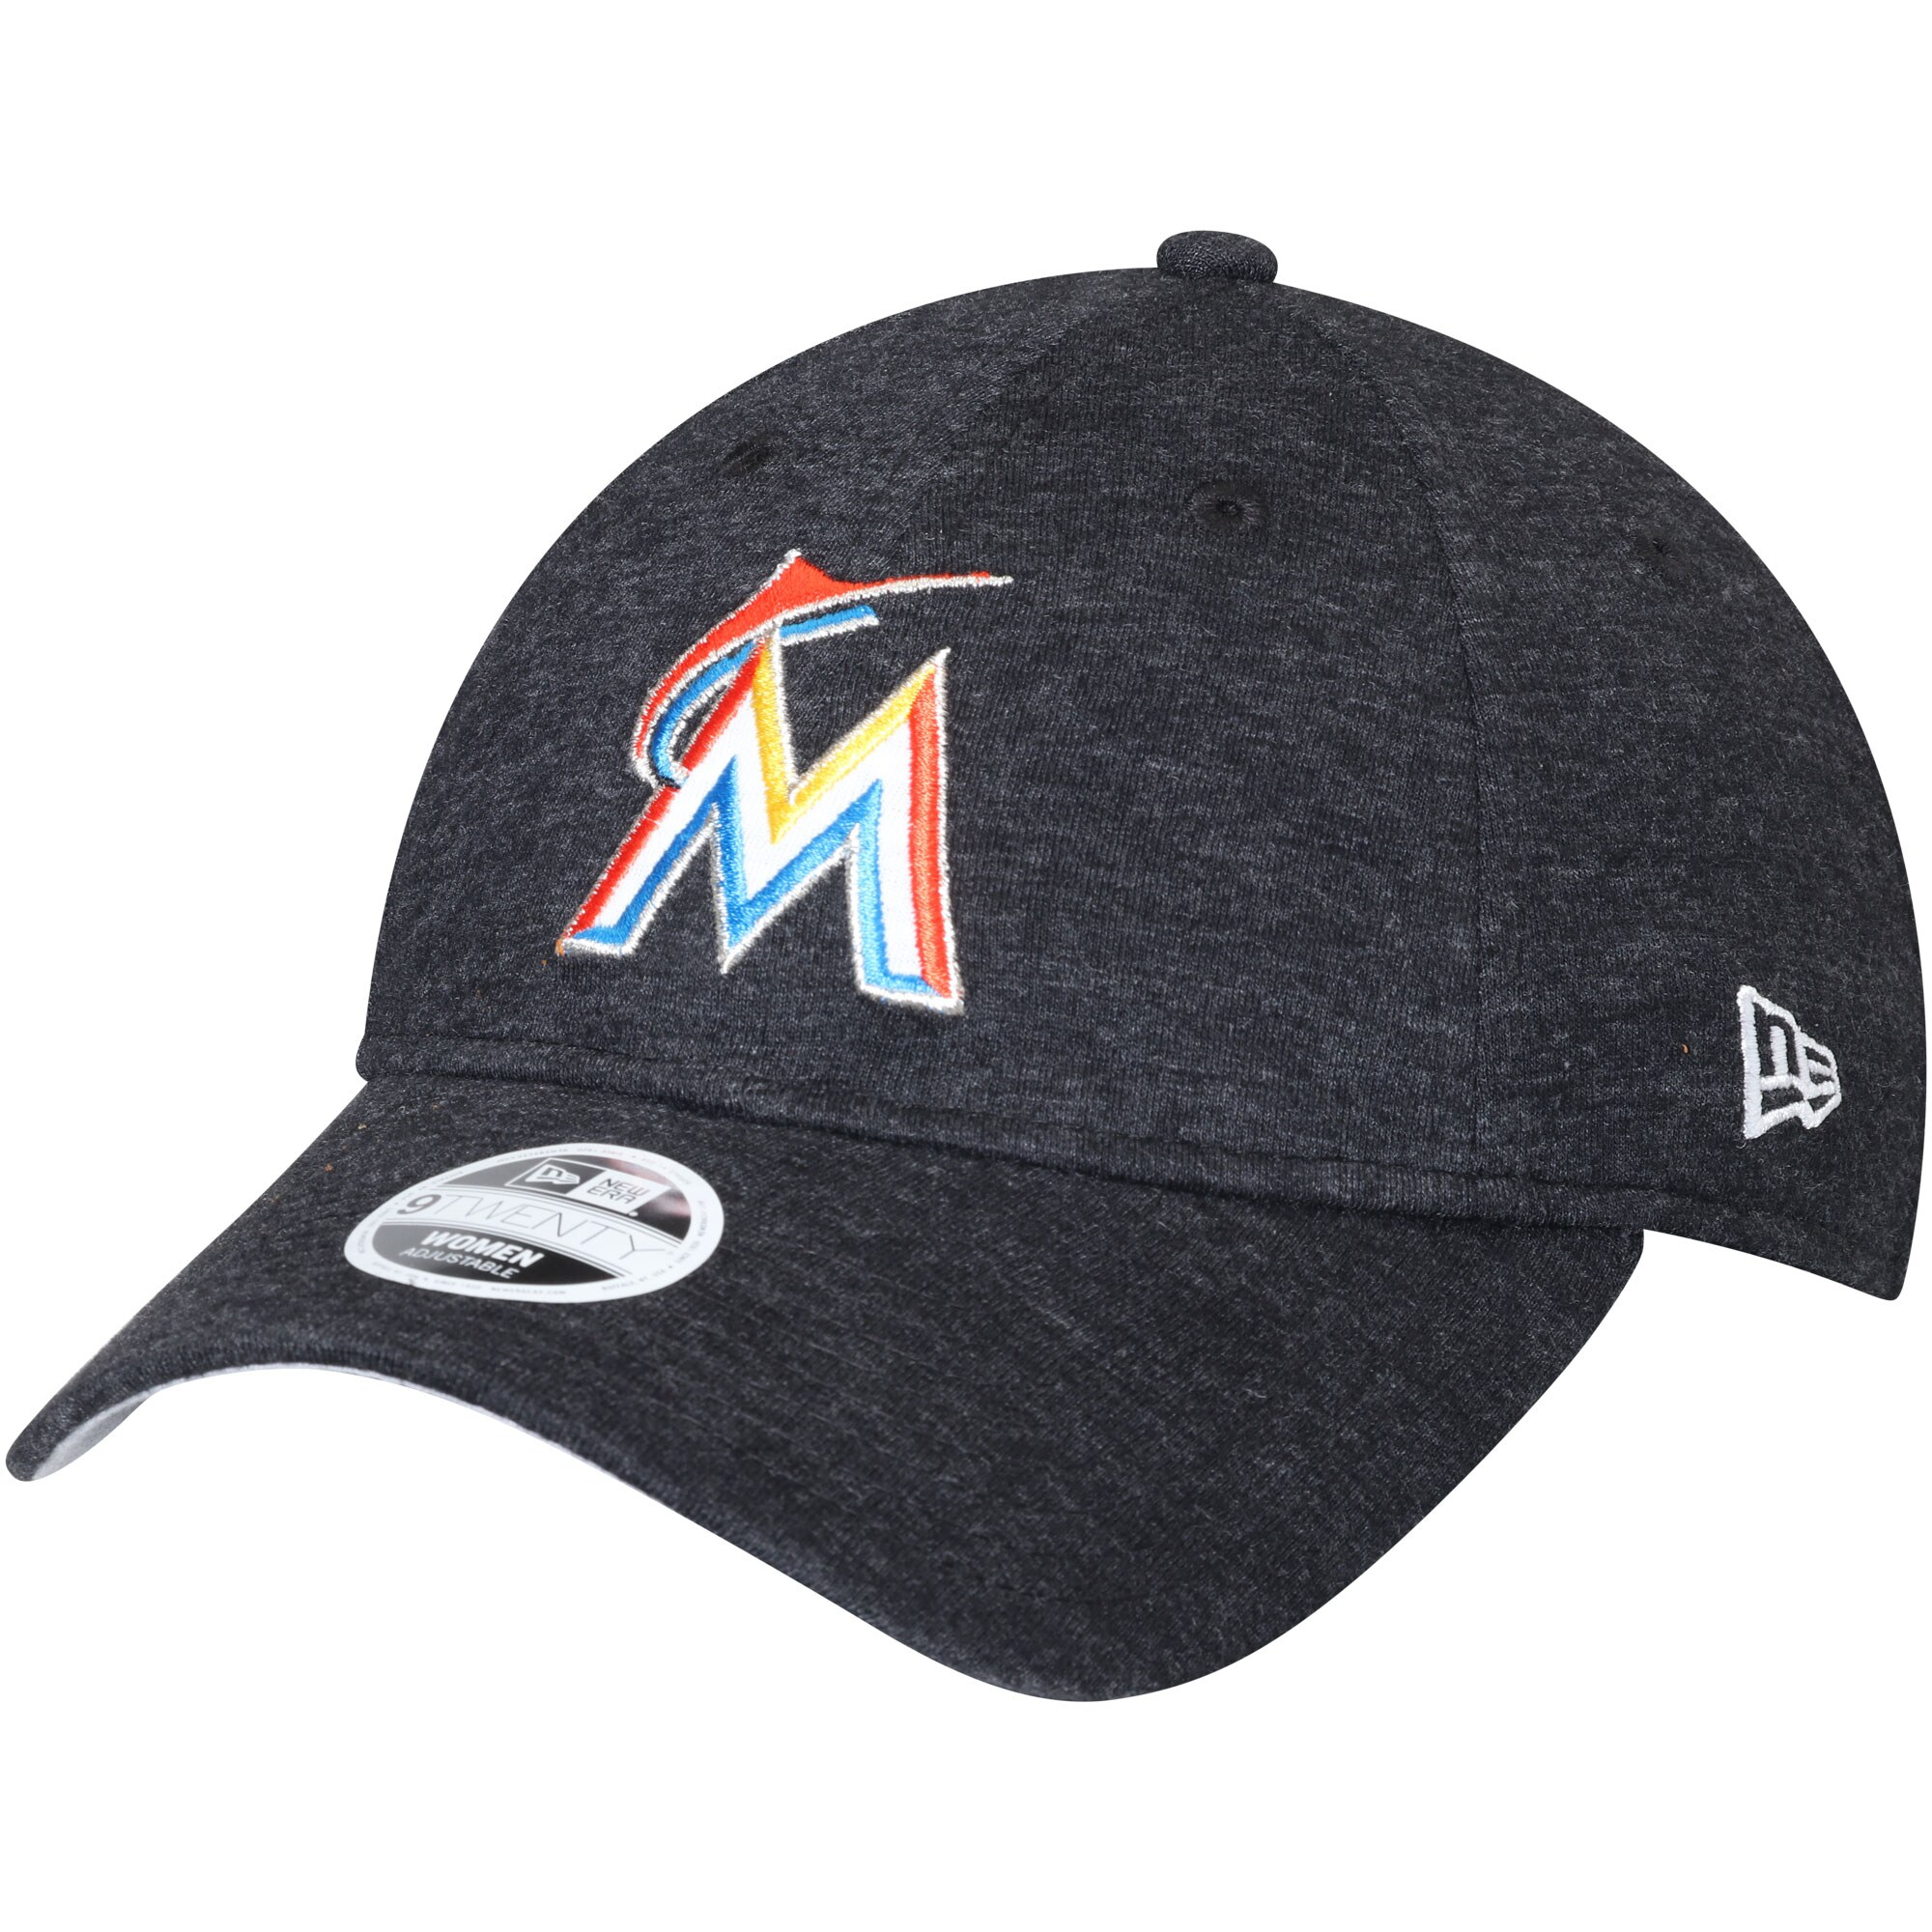 Miami Marlins New Era Women's Team Multi Tone 9TWENTY Adjustable Hat - Heathered Black